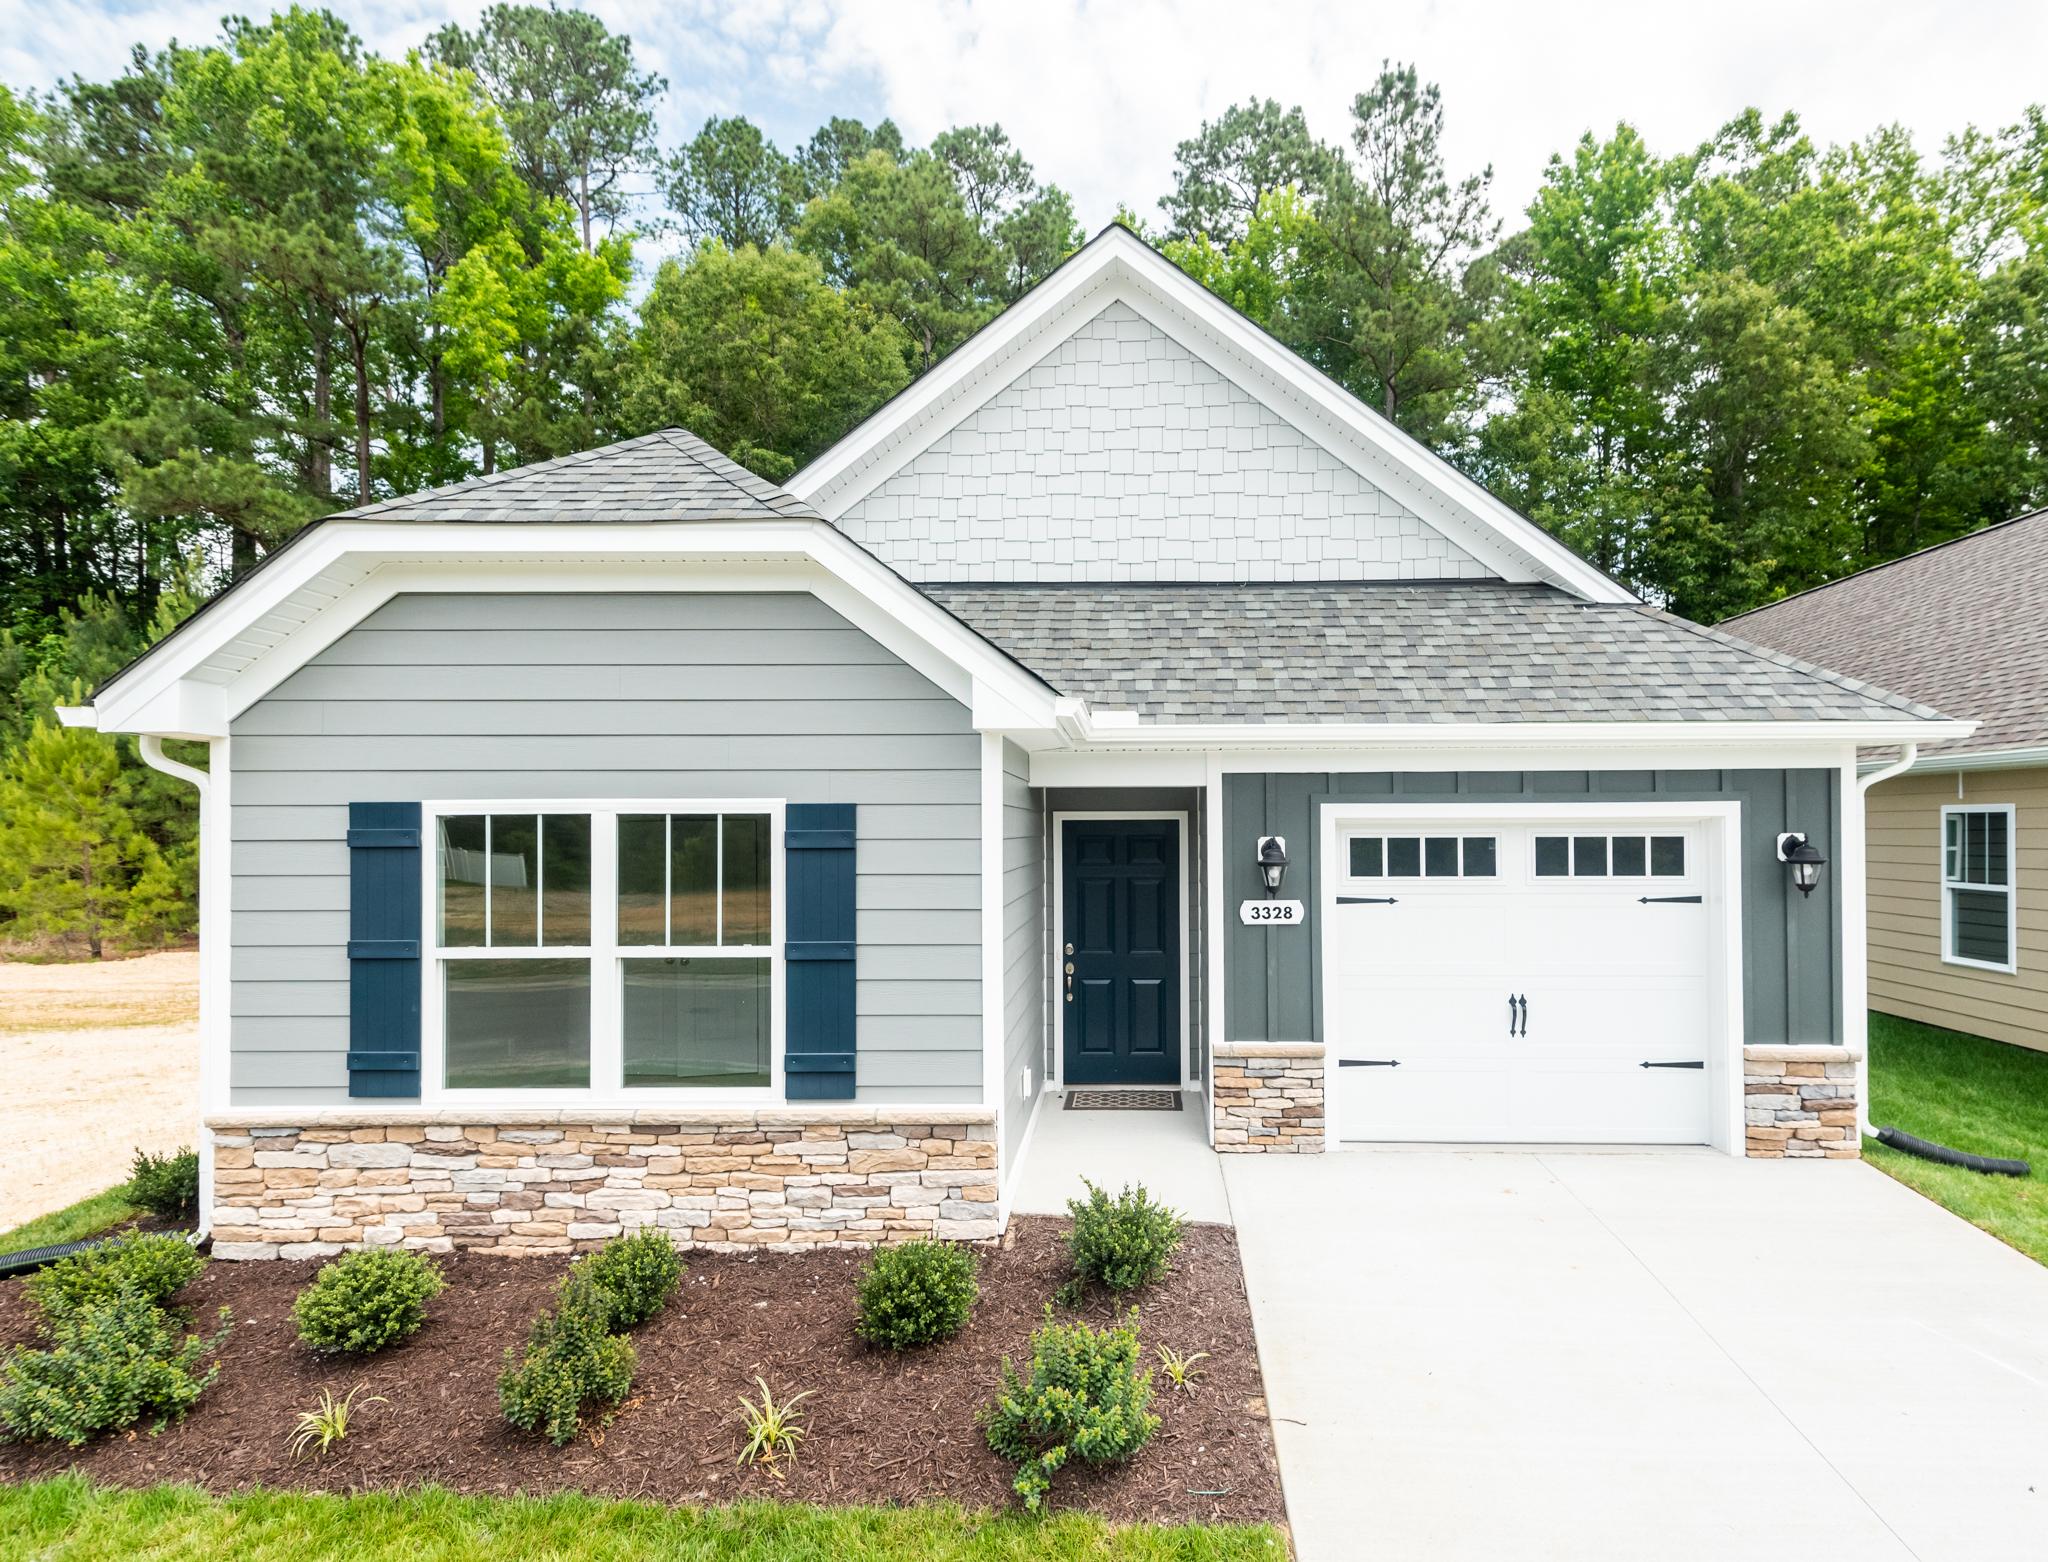 Virginia real estate Photographer-_DSC7142-2